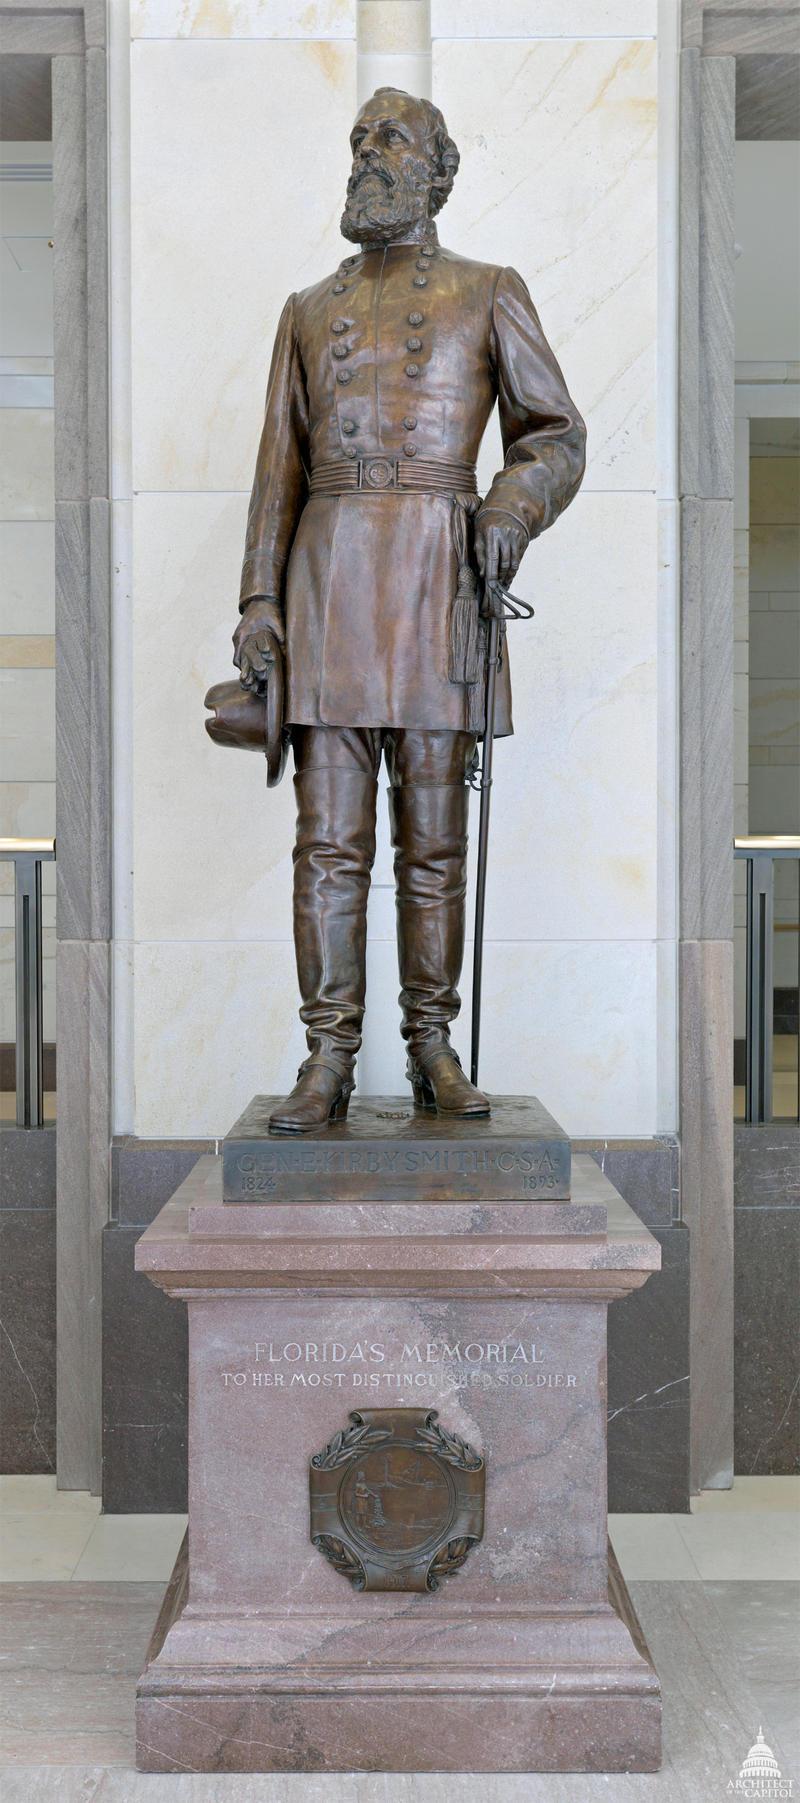 Florida's statue of Edmund Kirby Smith in Washington D.C.